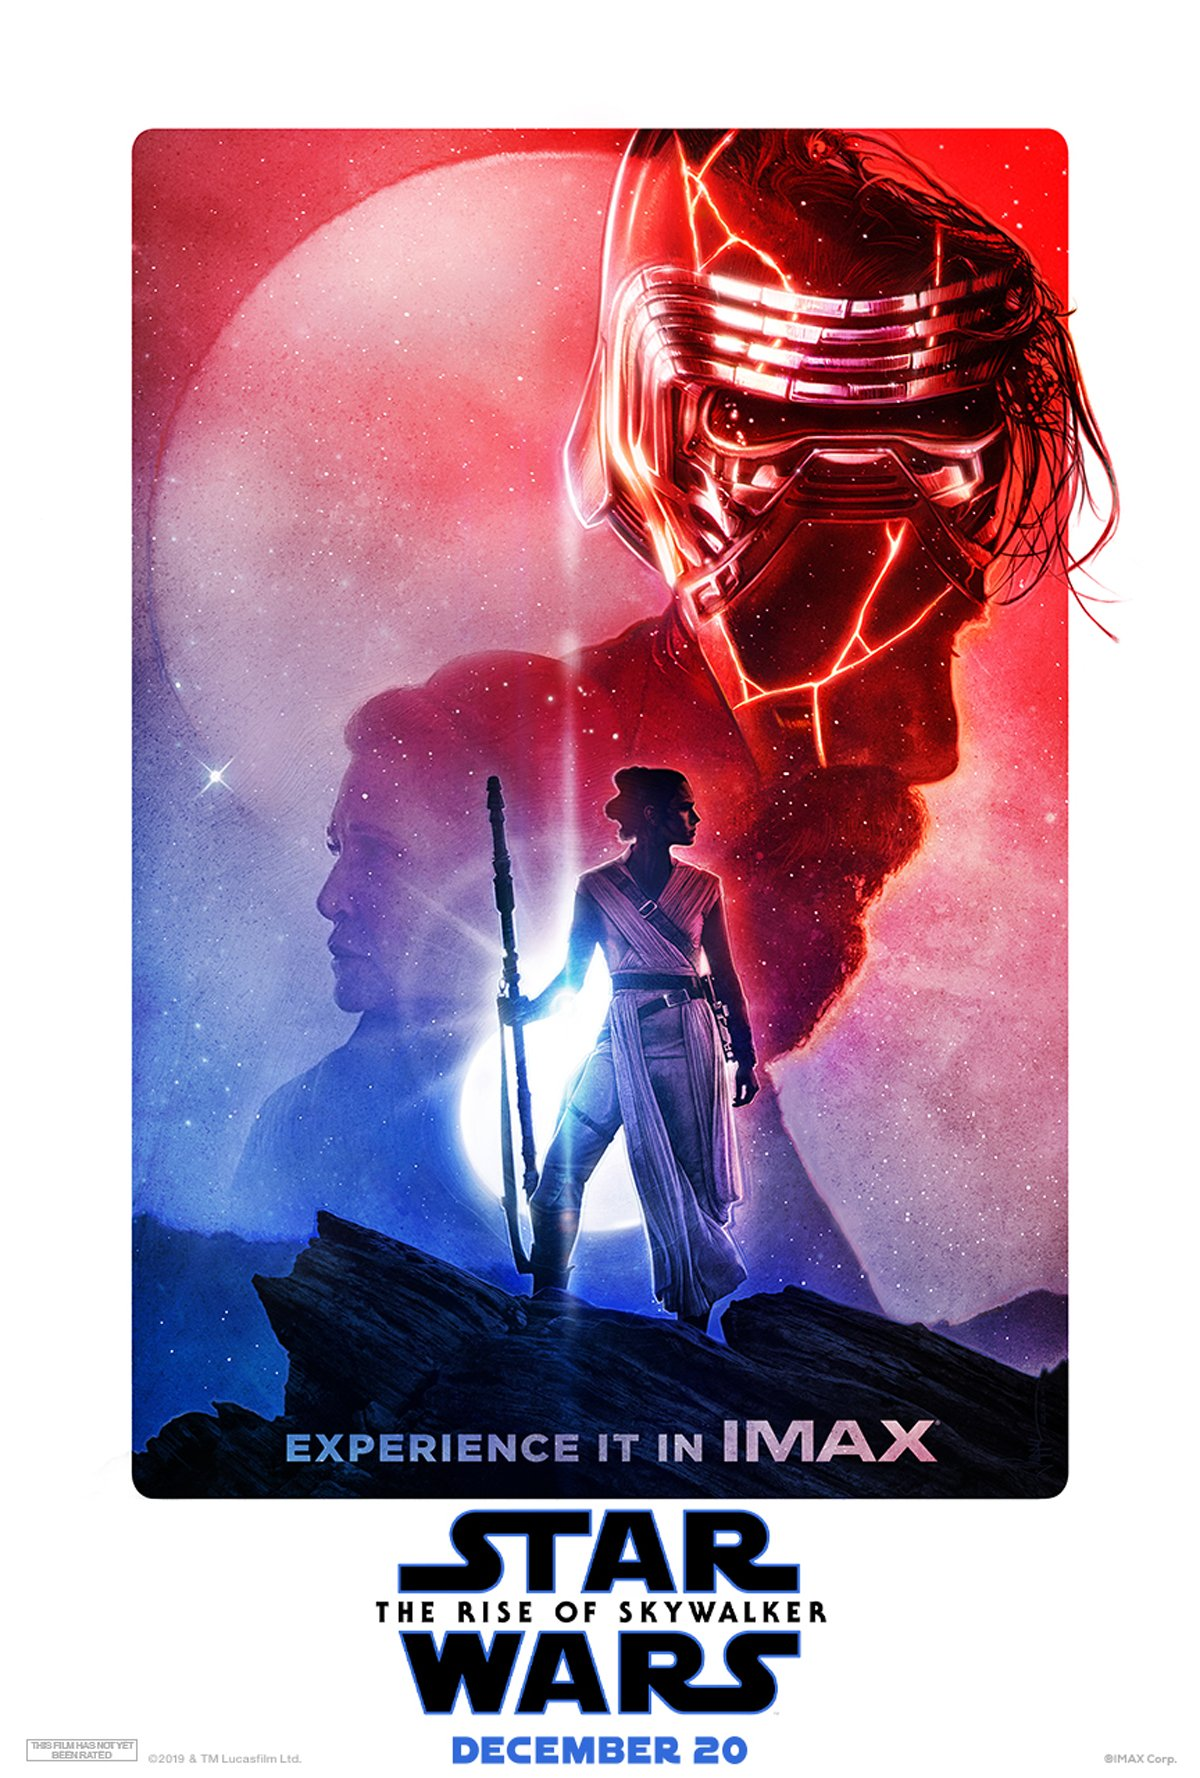 Star Wars: The Rise of Skywalker IMAX art poster